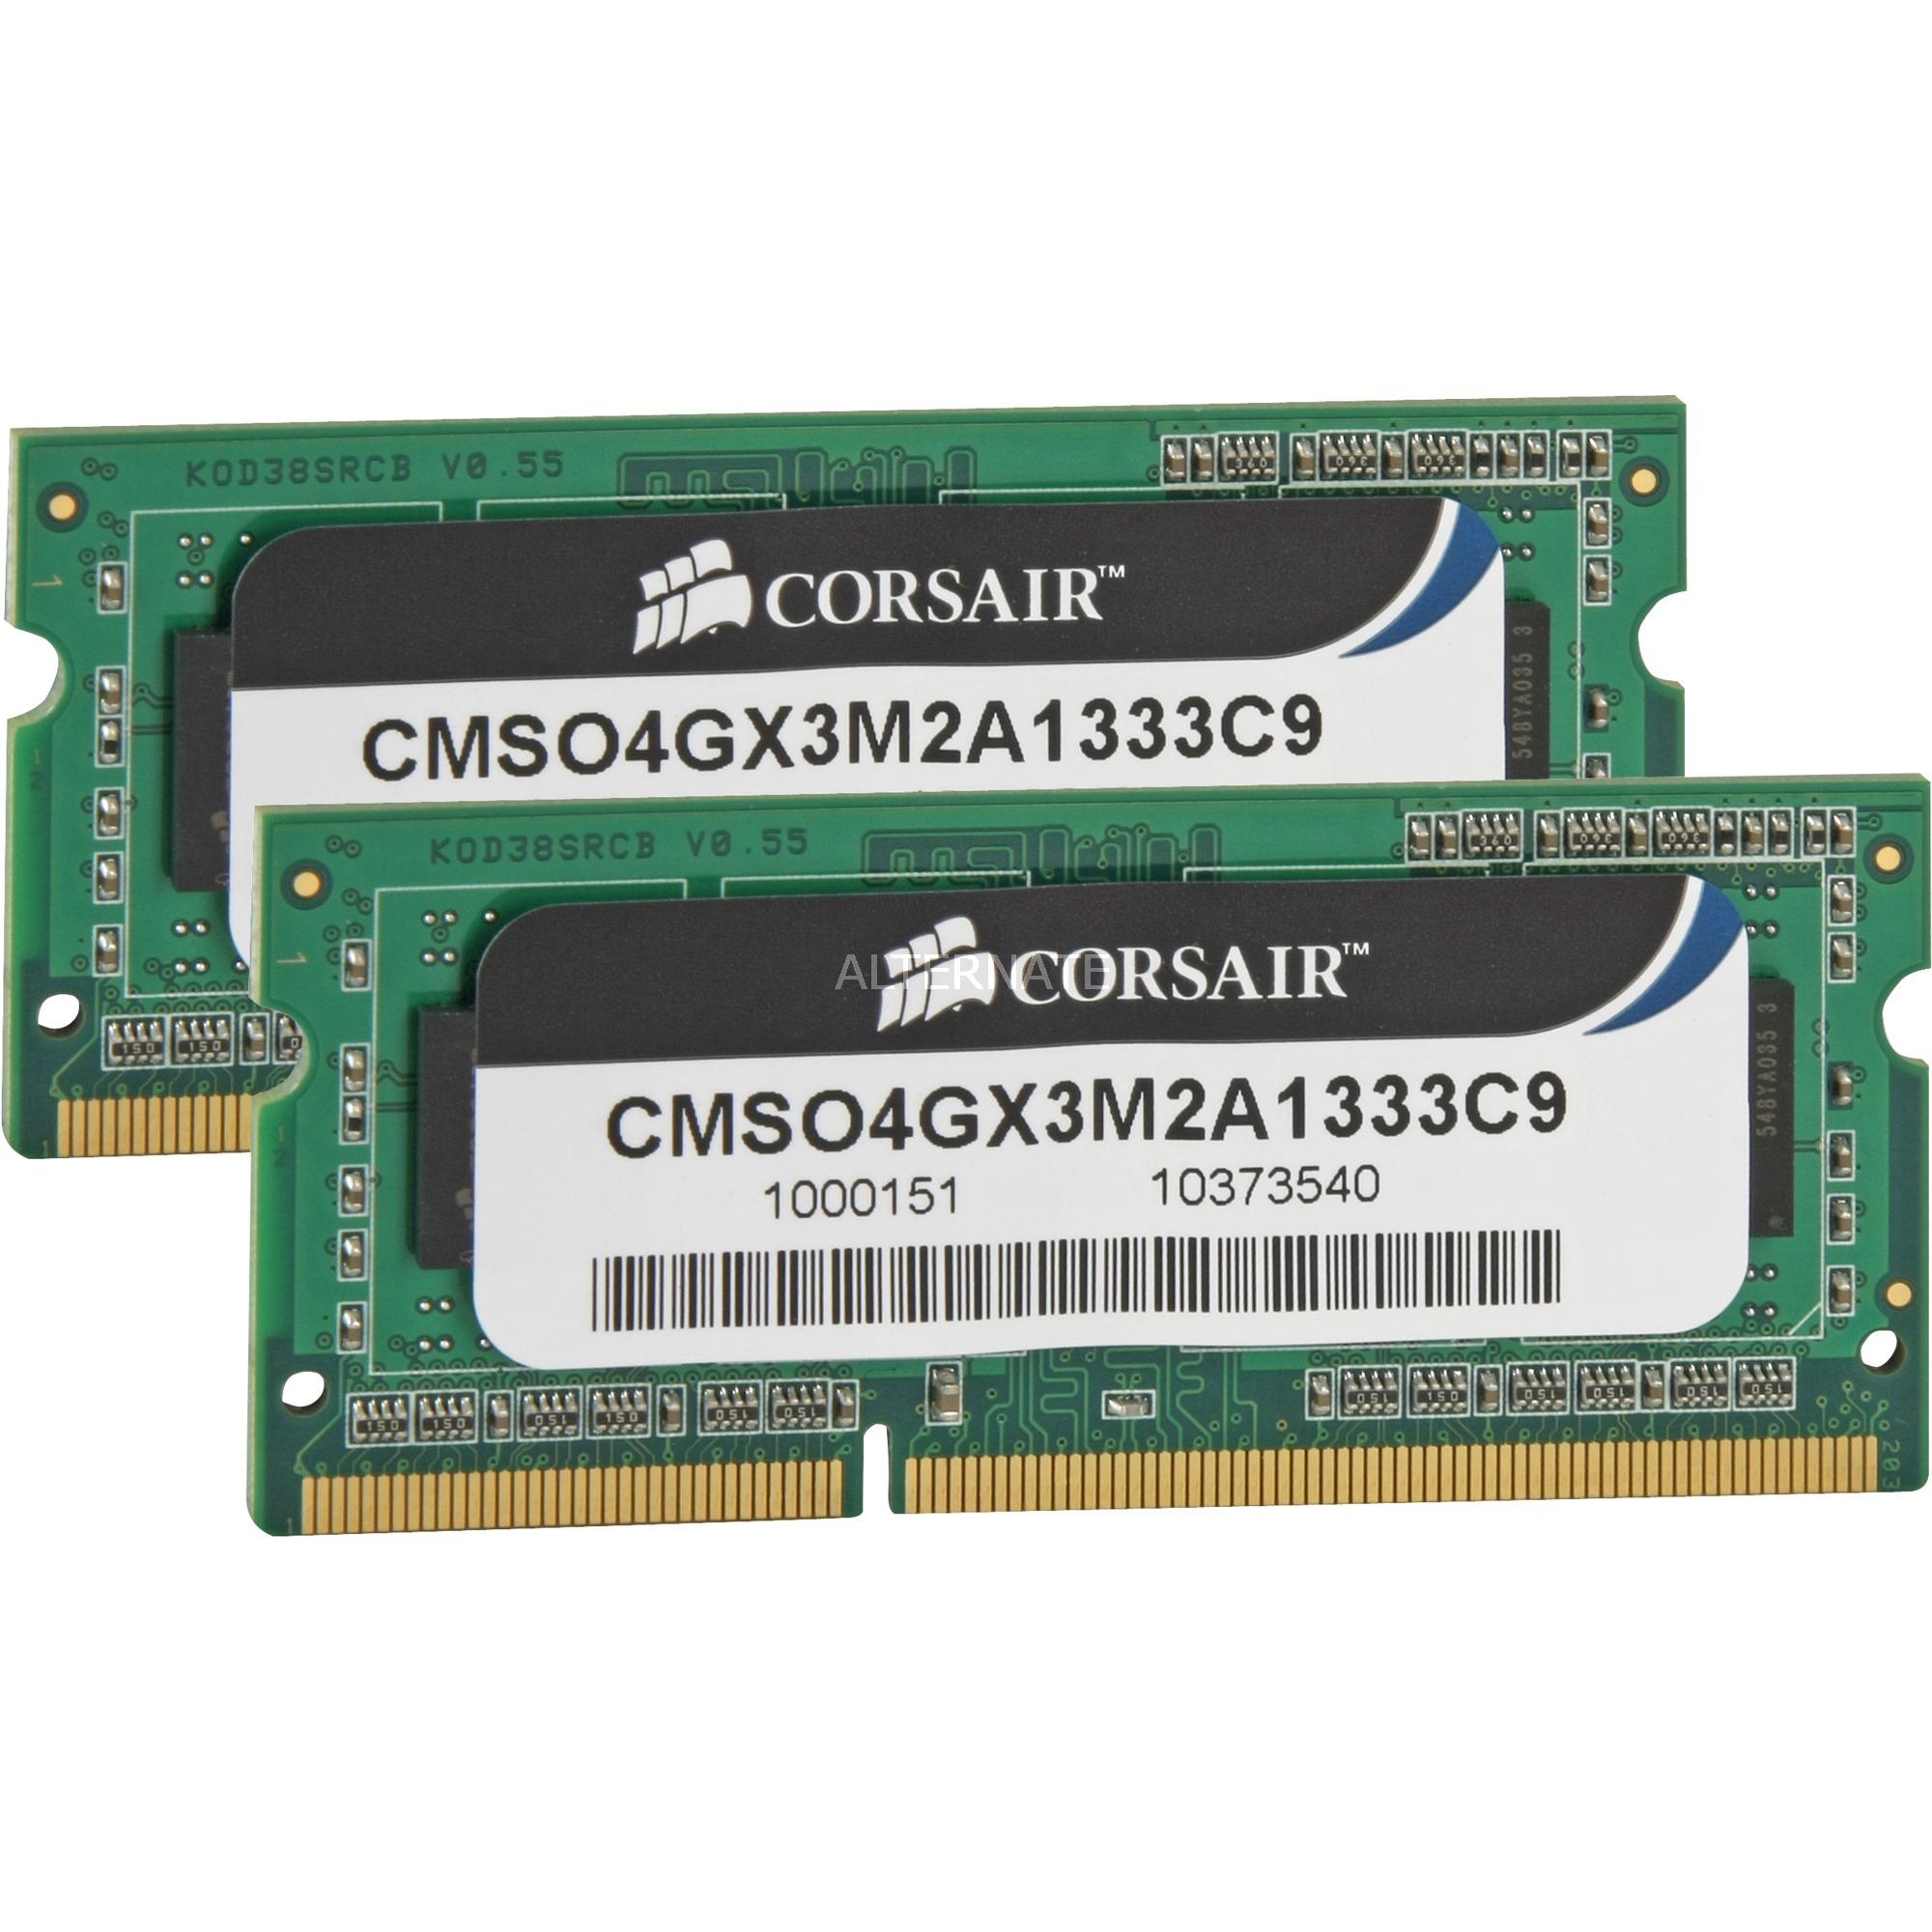 Corsair ValueSelect SO DIMM 4 GB DDR3 1333 Kit Arbeitsspeicher CMSO4GX3M2A1333C9 Lite Retail